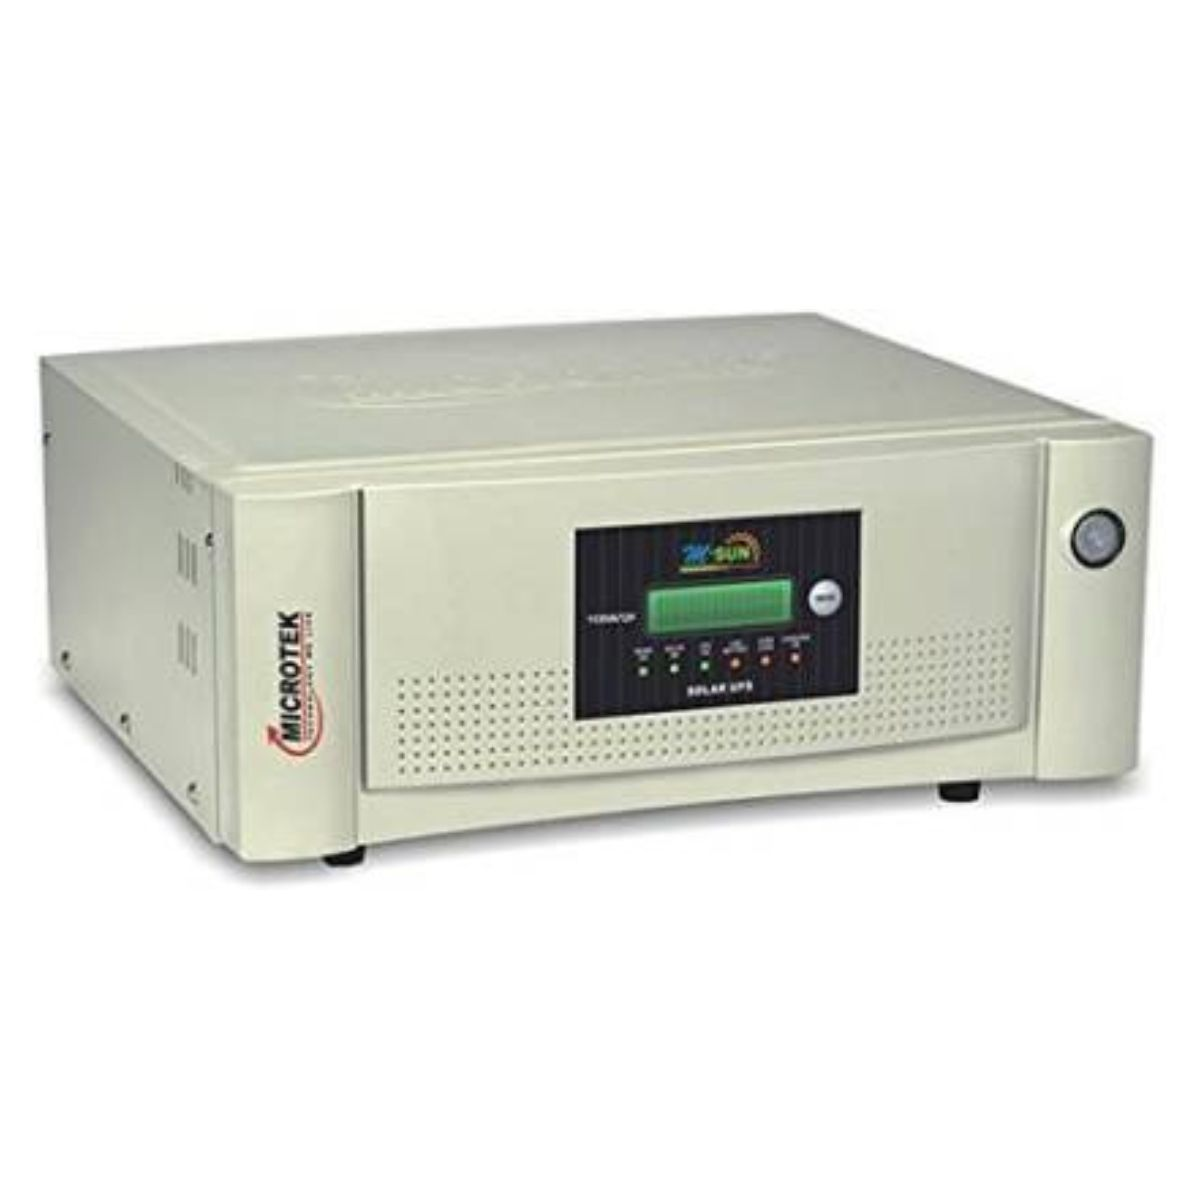 Microtek SOLAR PCU 1435/12V Pure Sine Wave Inverter